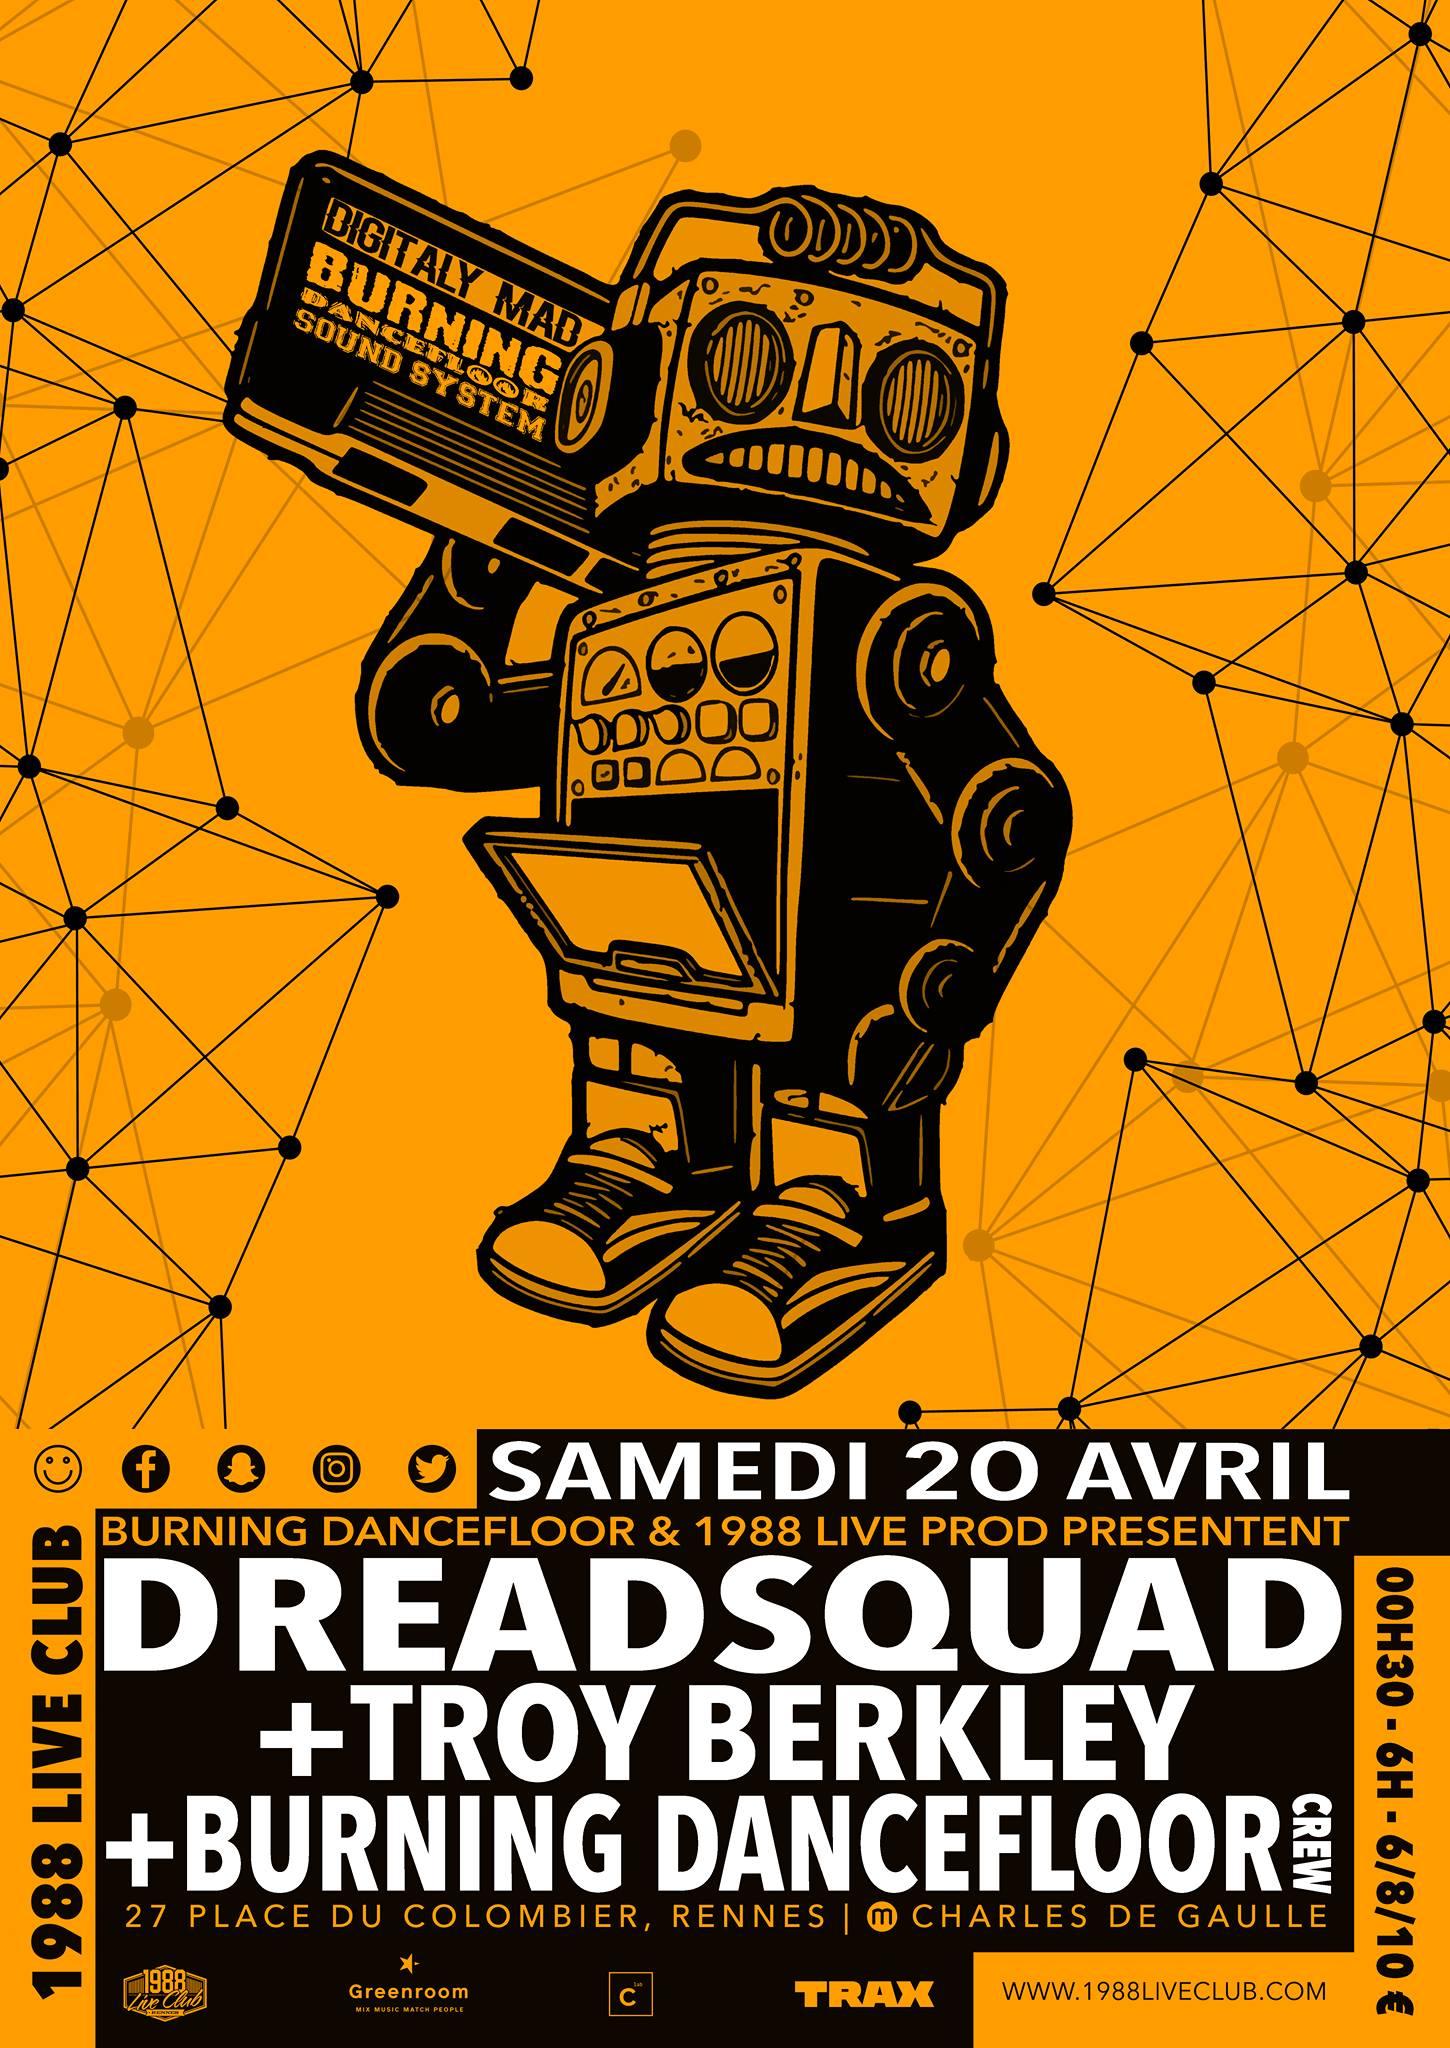 Dreadsquad x Troy Berkley x Burning Dancefloor Crew